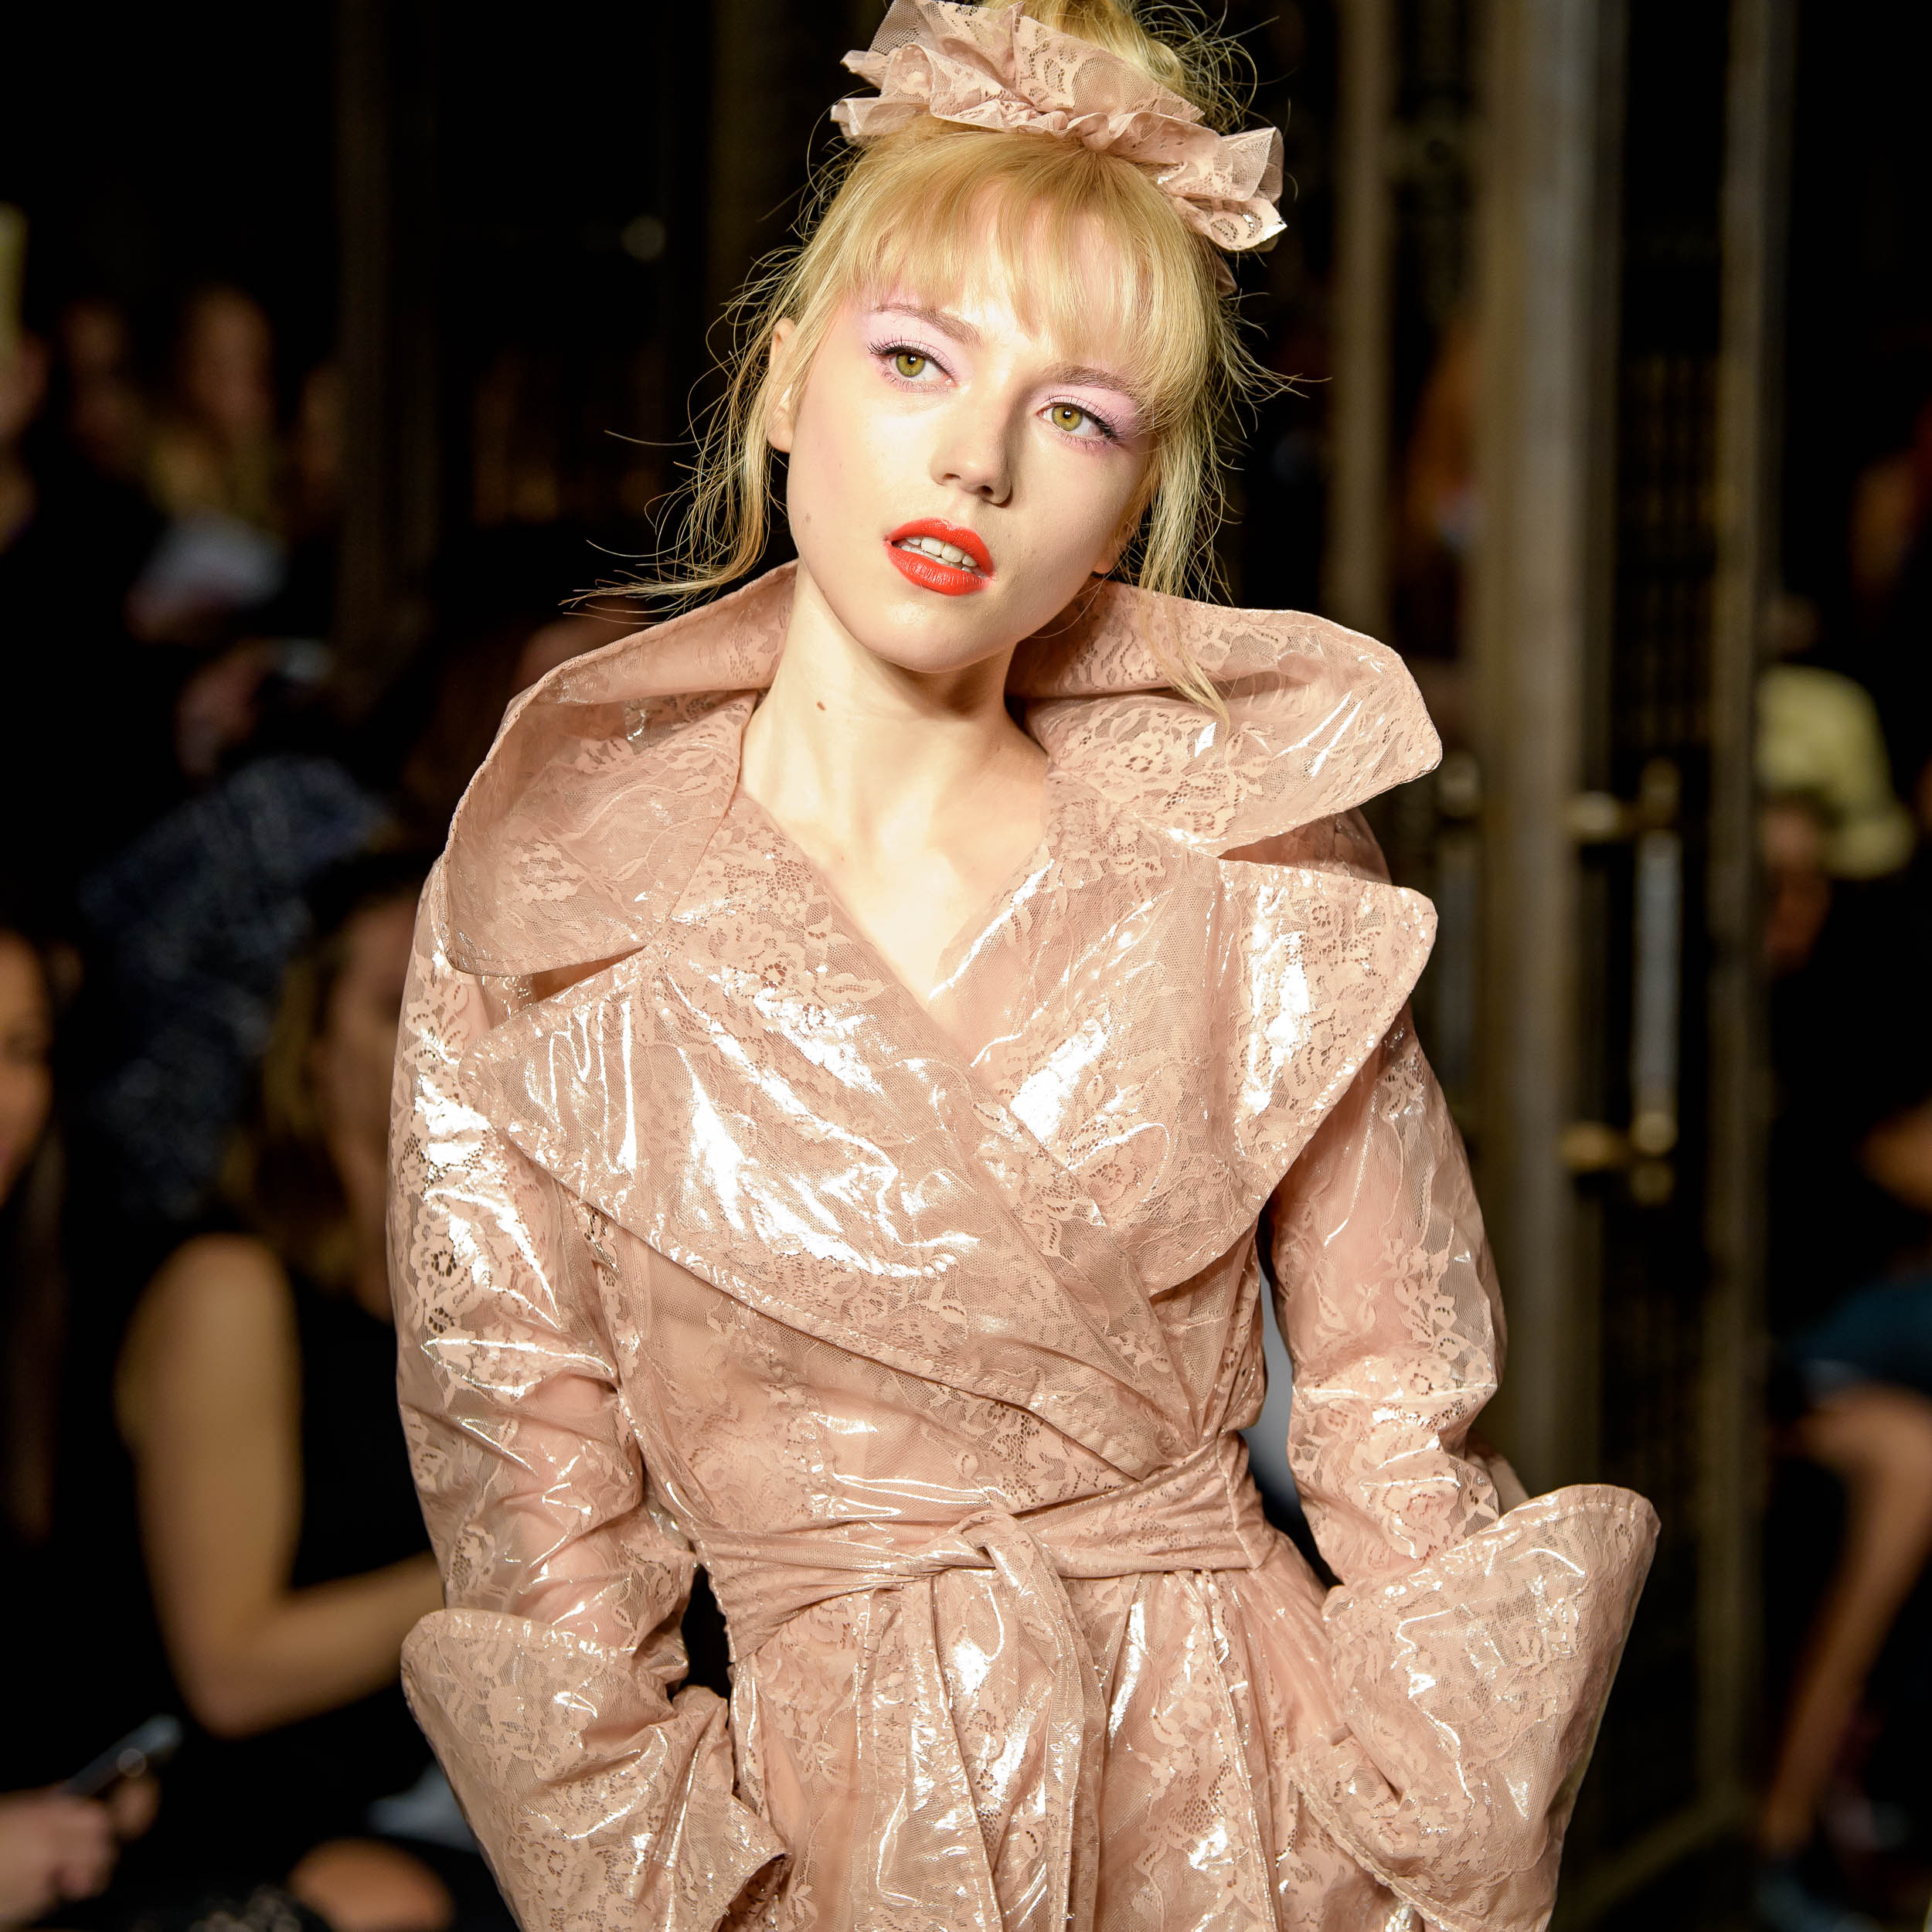 London Fashion Week S/S18 fashion designer Pam Hogg modeled by Ellie Raé Winstone photo Barry Green